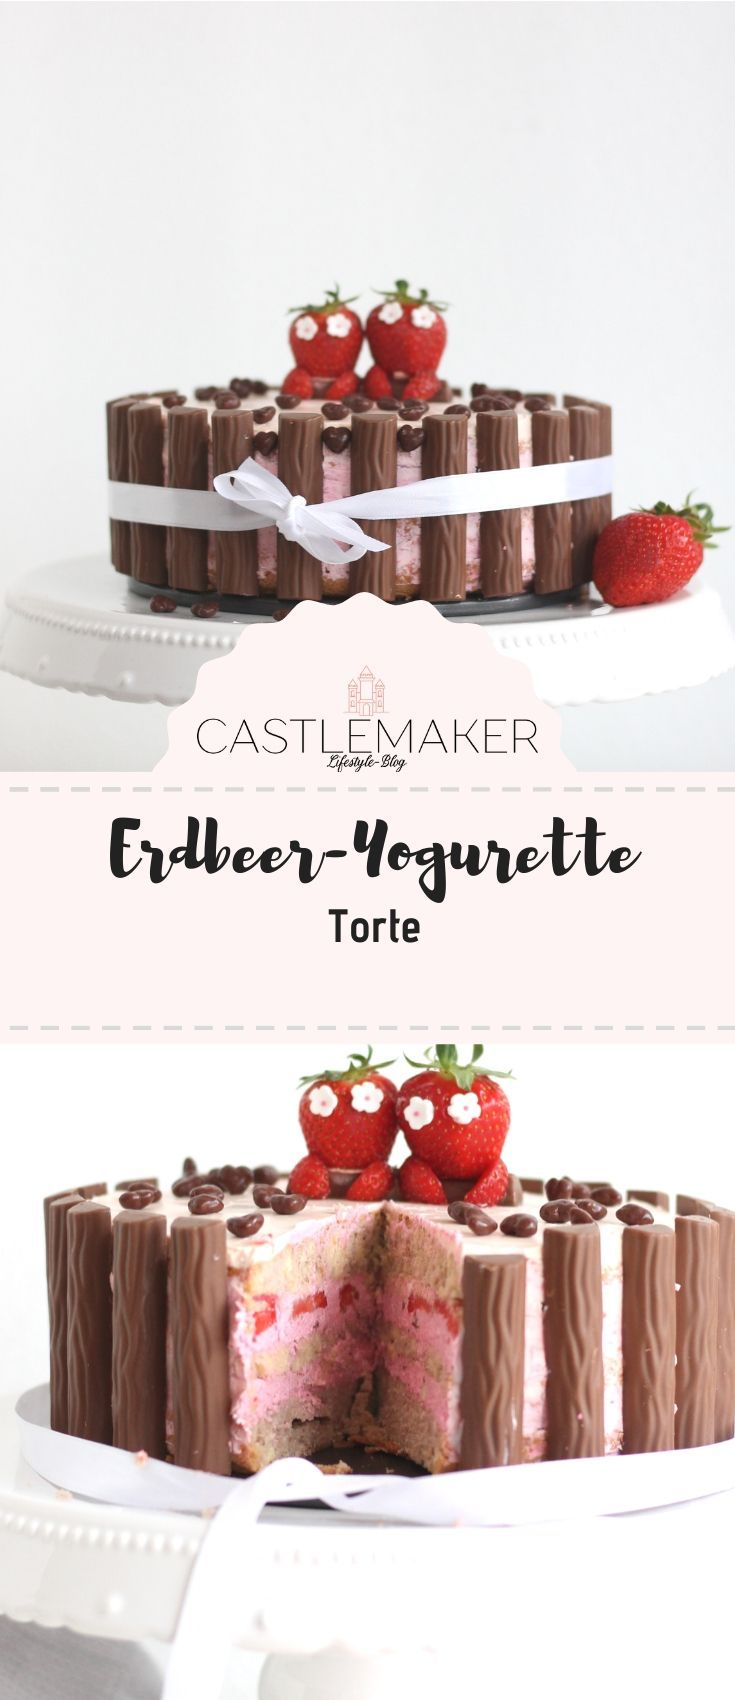 Rezept Yogurette Torte Mit Erdbeeren Castlemaker Food Lifestyle Magazin Strawberry Cakes Yummy Cakes Fruit Cake